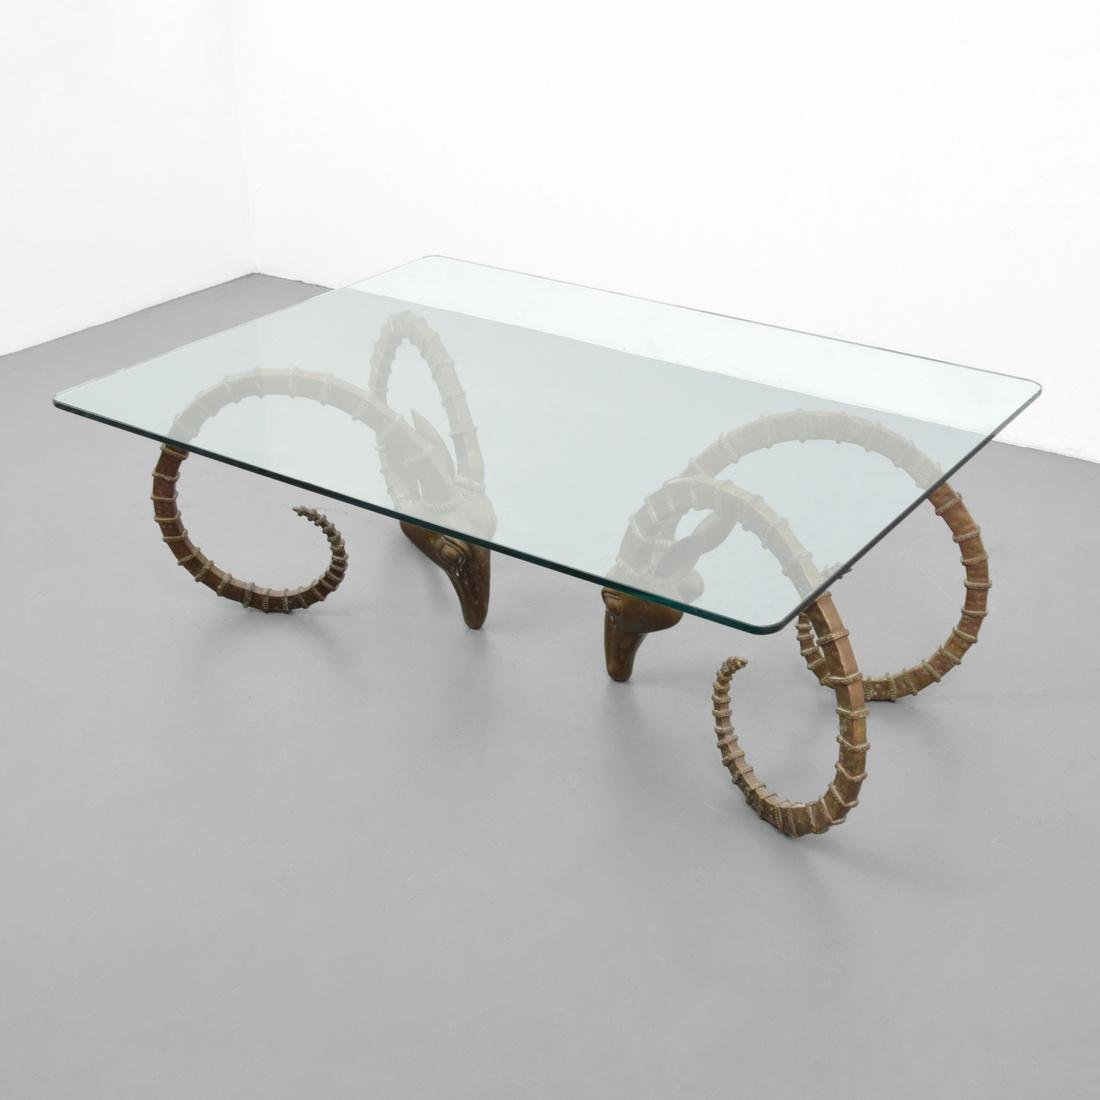 Ibex Coffee Table, Manner of Alain Chervet - 4